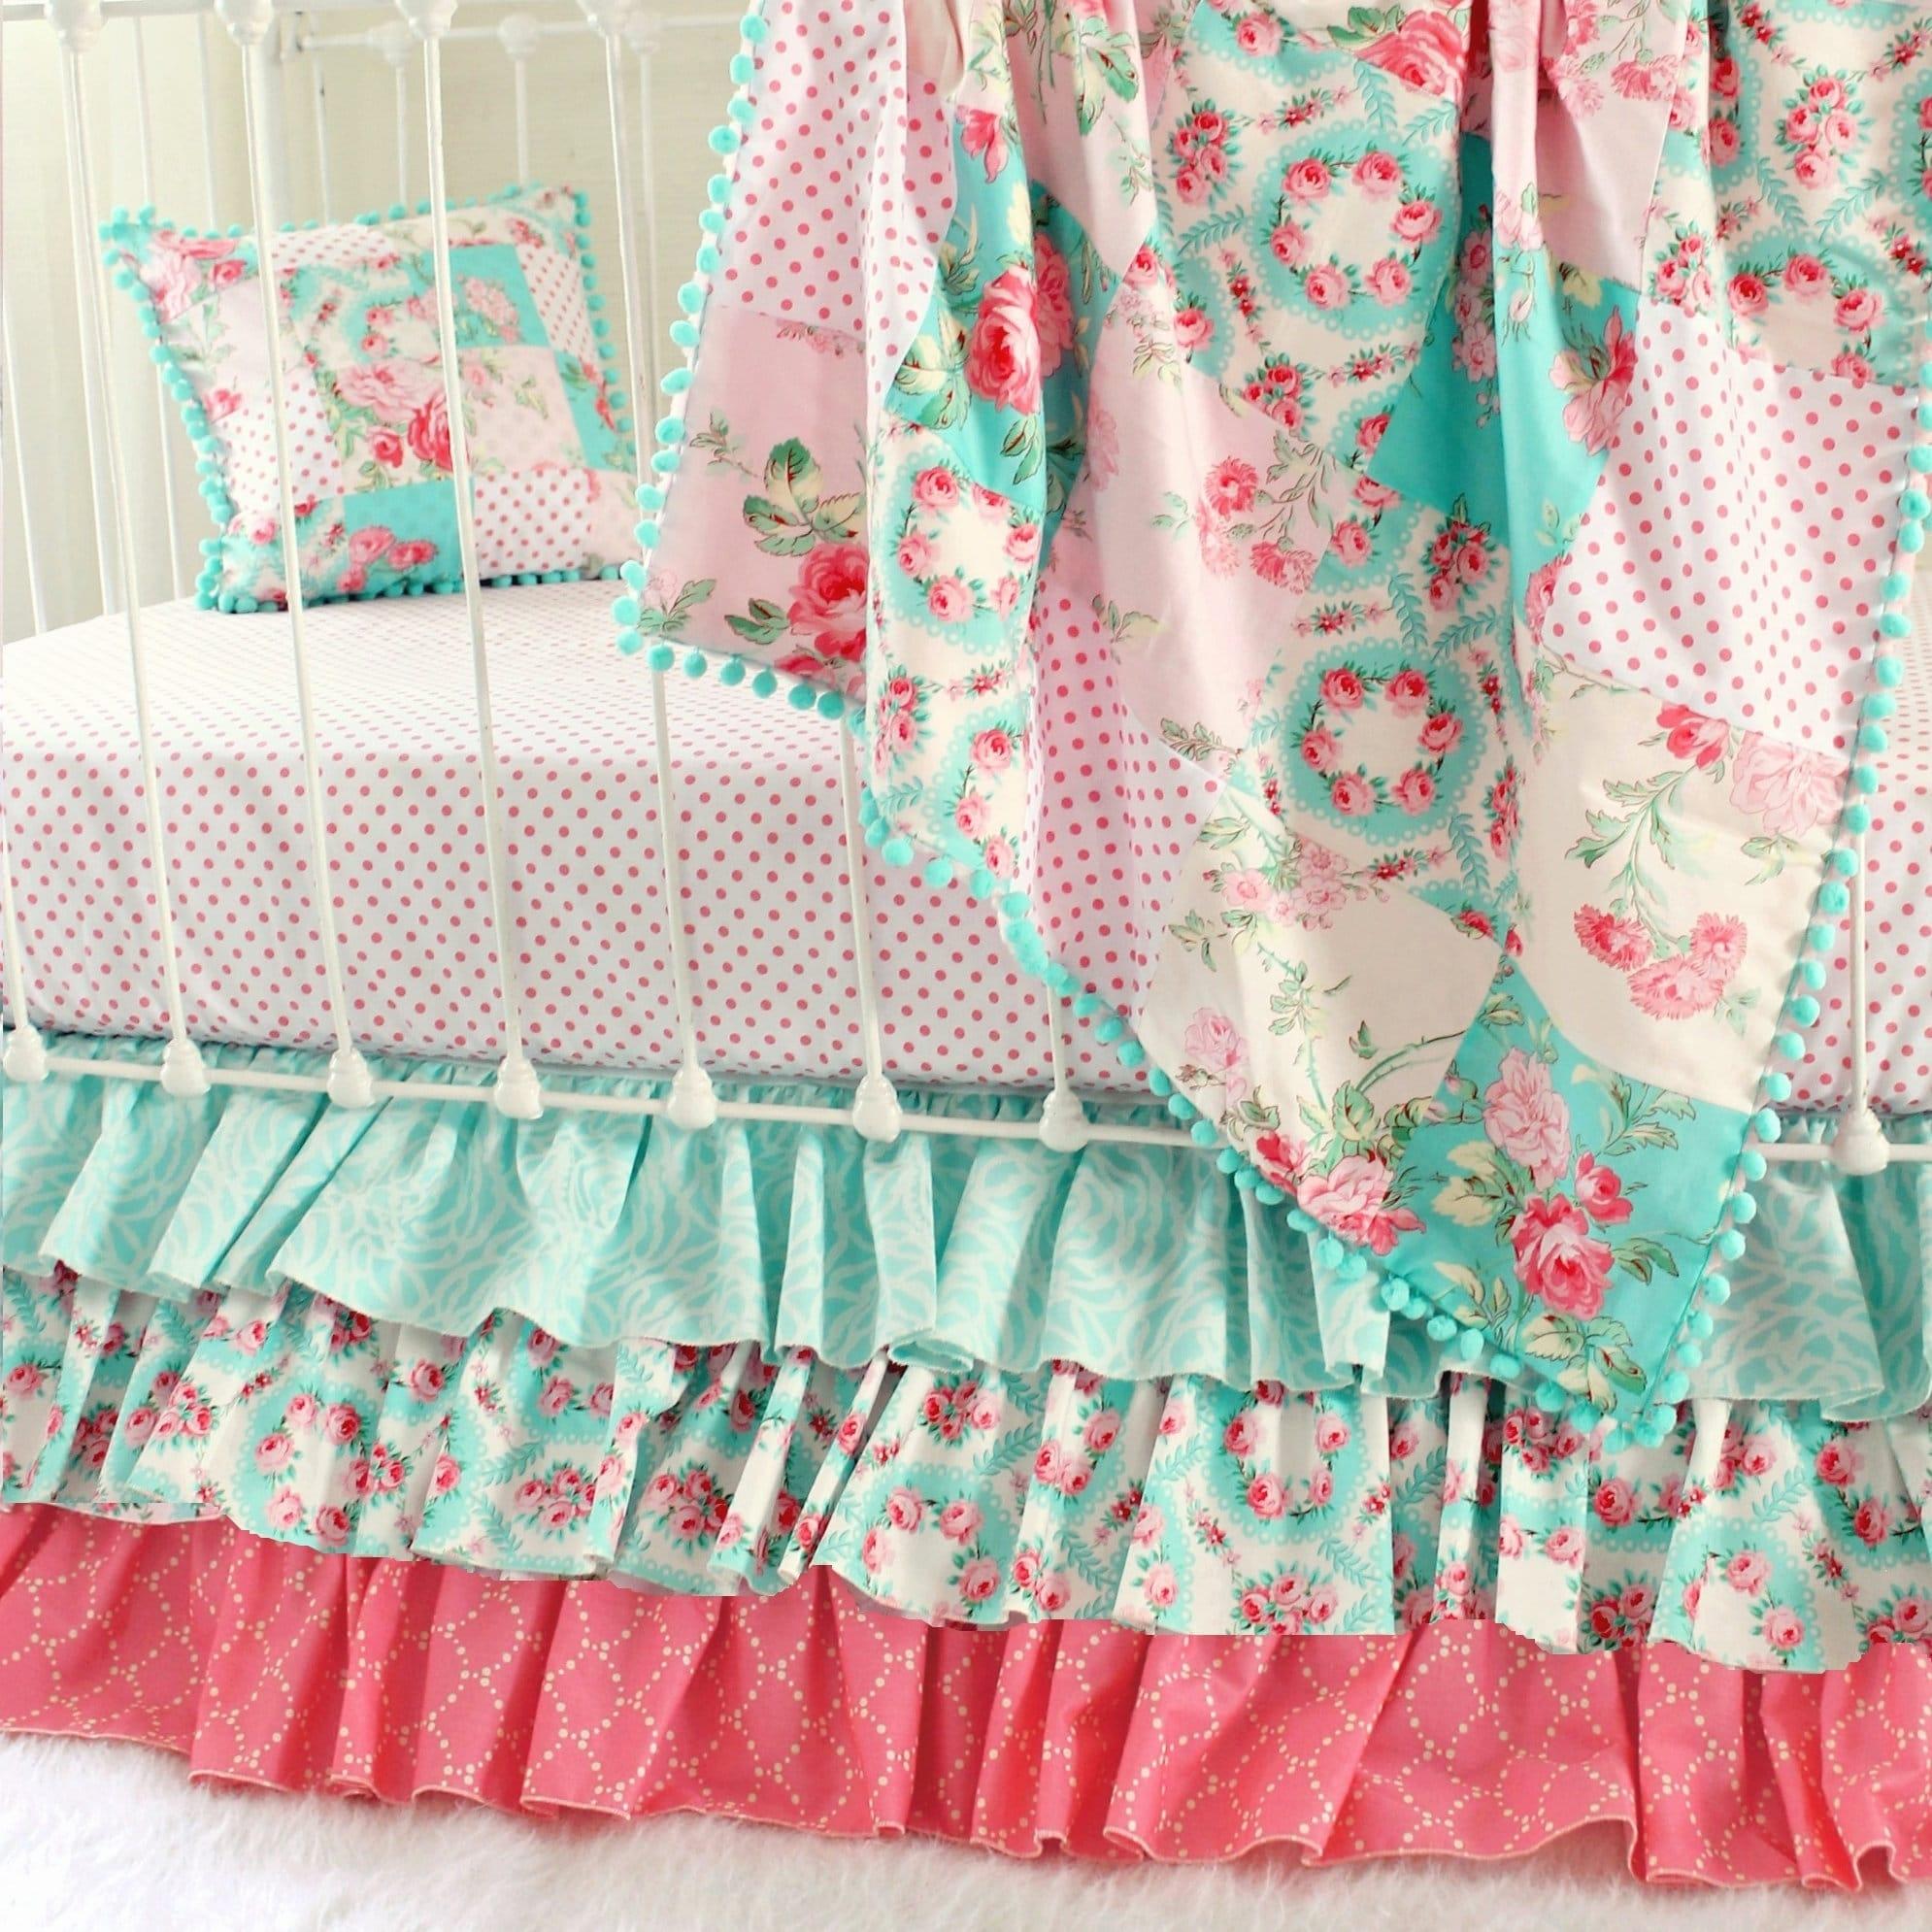 Girls Vintage Roses Crib Bedding With Ruffled Crib Skirt